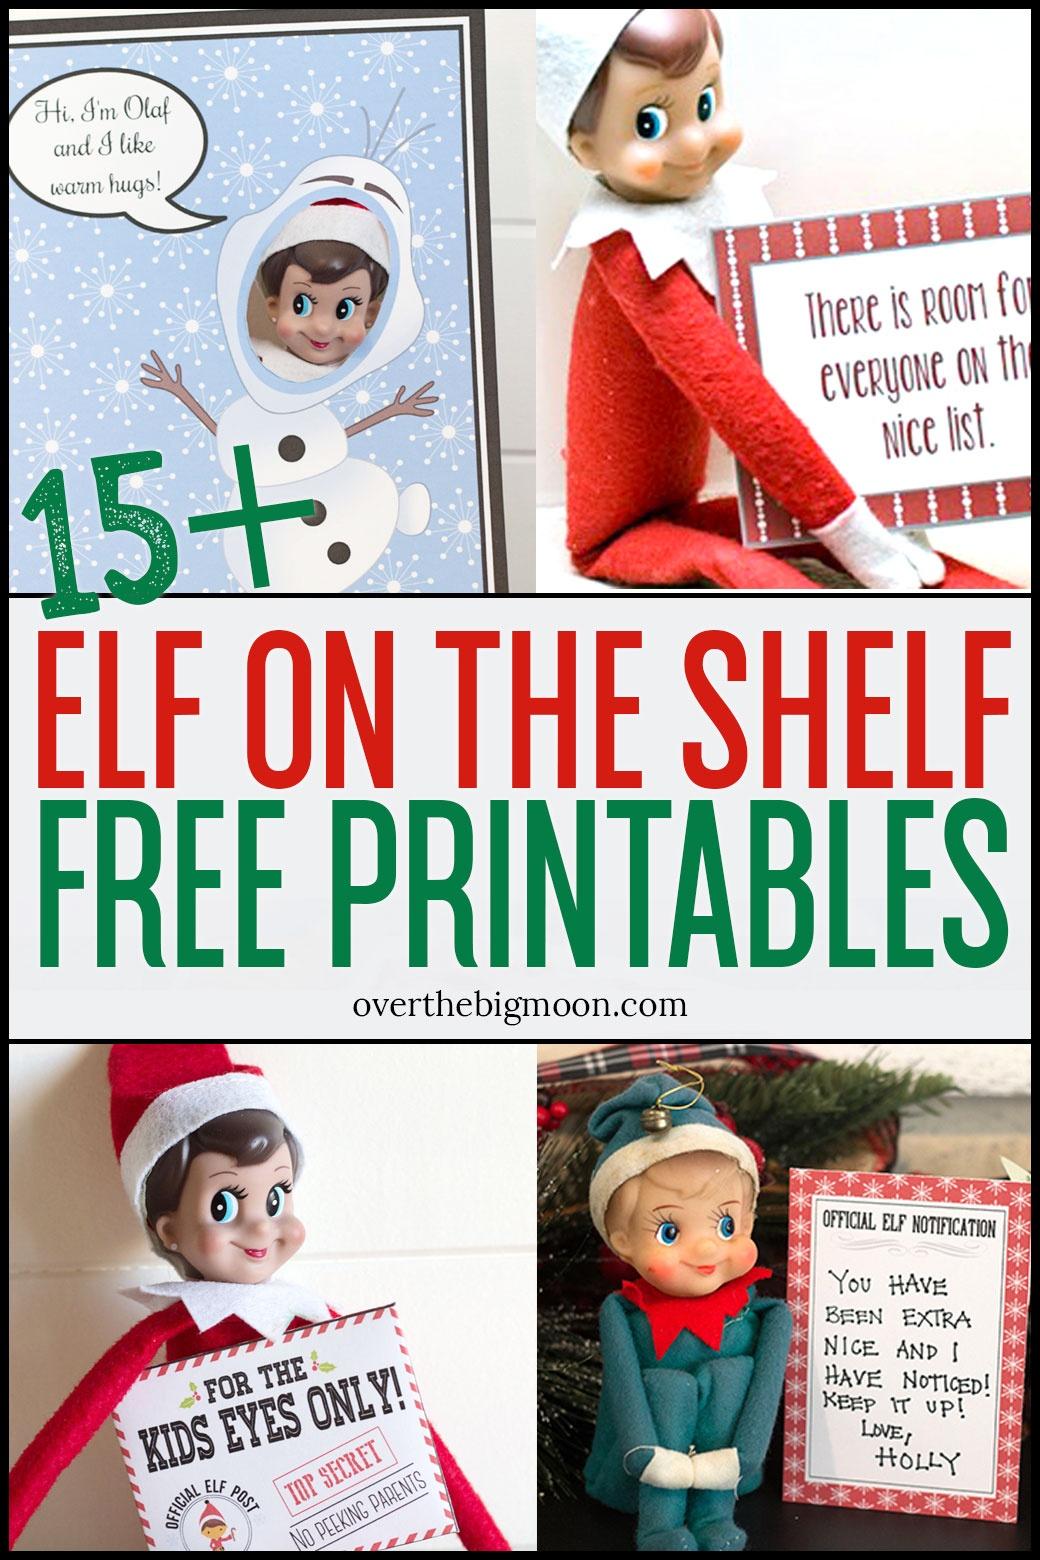 Elf On The Shelf Printables & Ideas | Over The Big Moon - Elf On The Shelf Free Printable Ideas